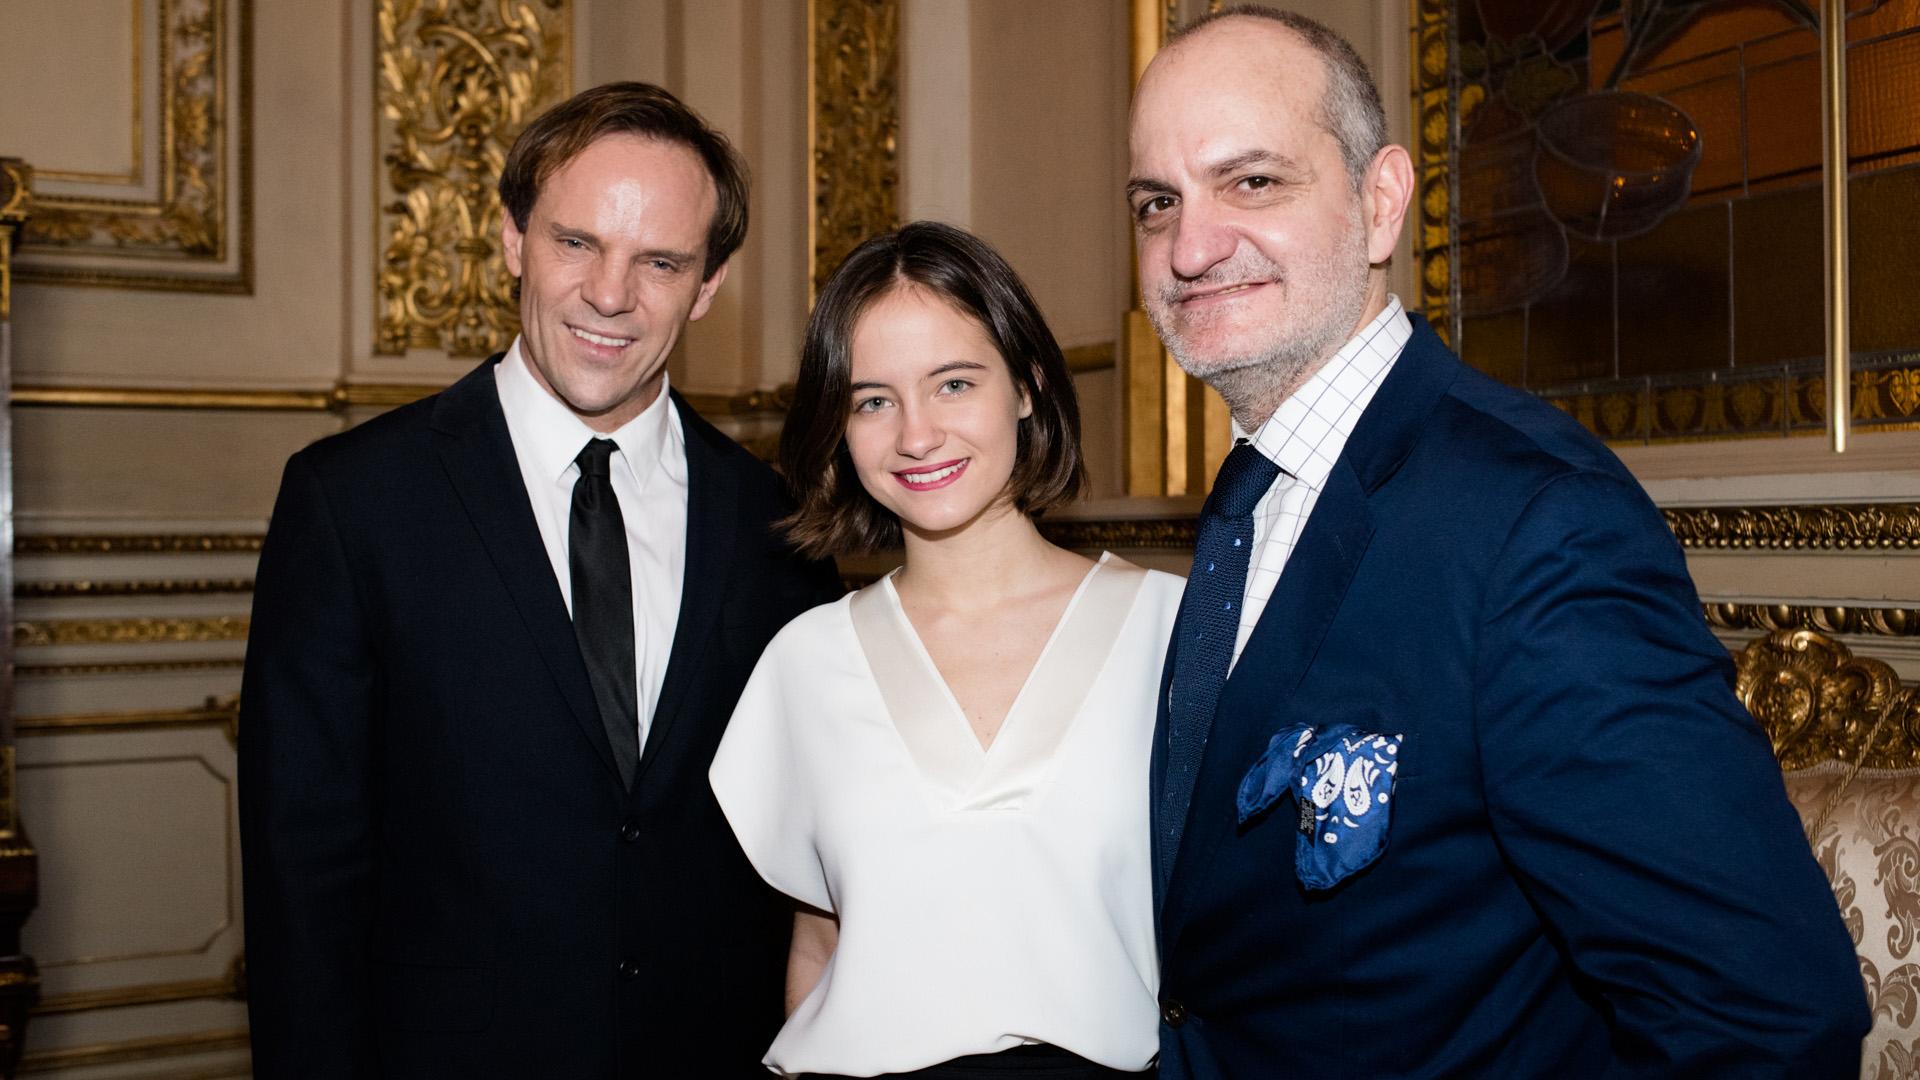 La modelo Violeta Juni junto a Thiago Pinheiro y Laurencio Adot